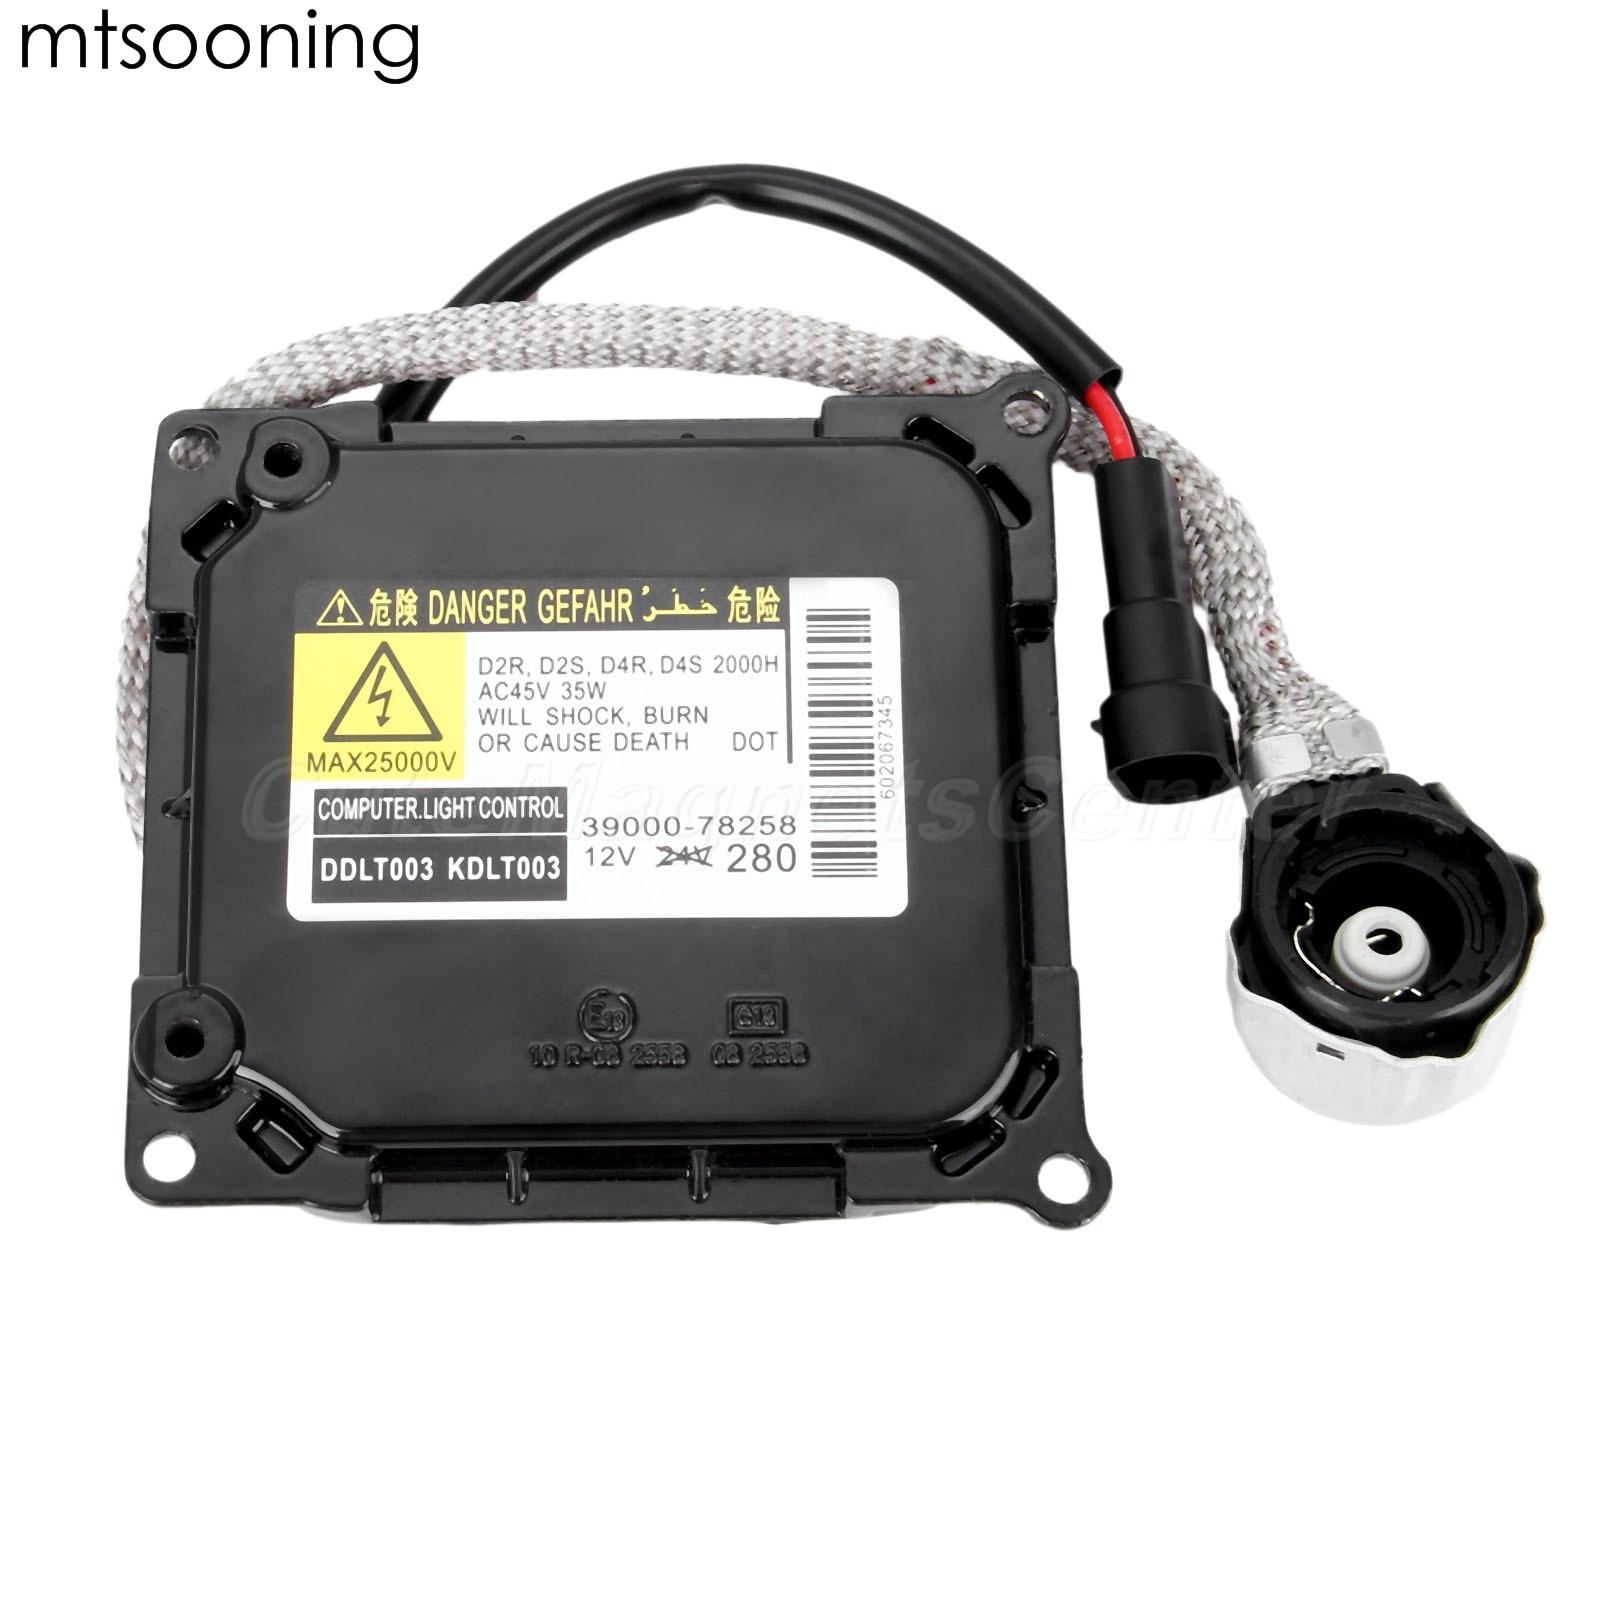 mtsooning 85967-52020 Xenon Headlight Ballast for Lexus ES350 SC430 GX460 RX450H Toyota Avalon XL XLS Venza V6